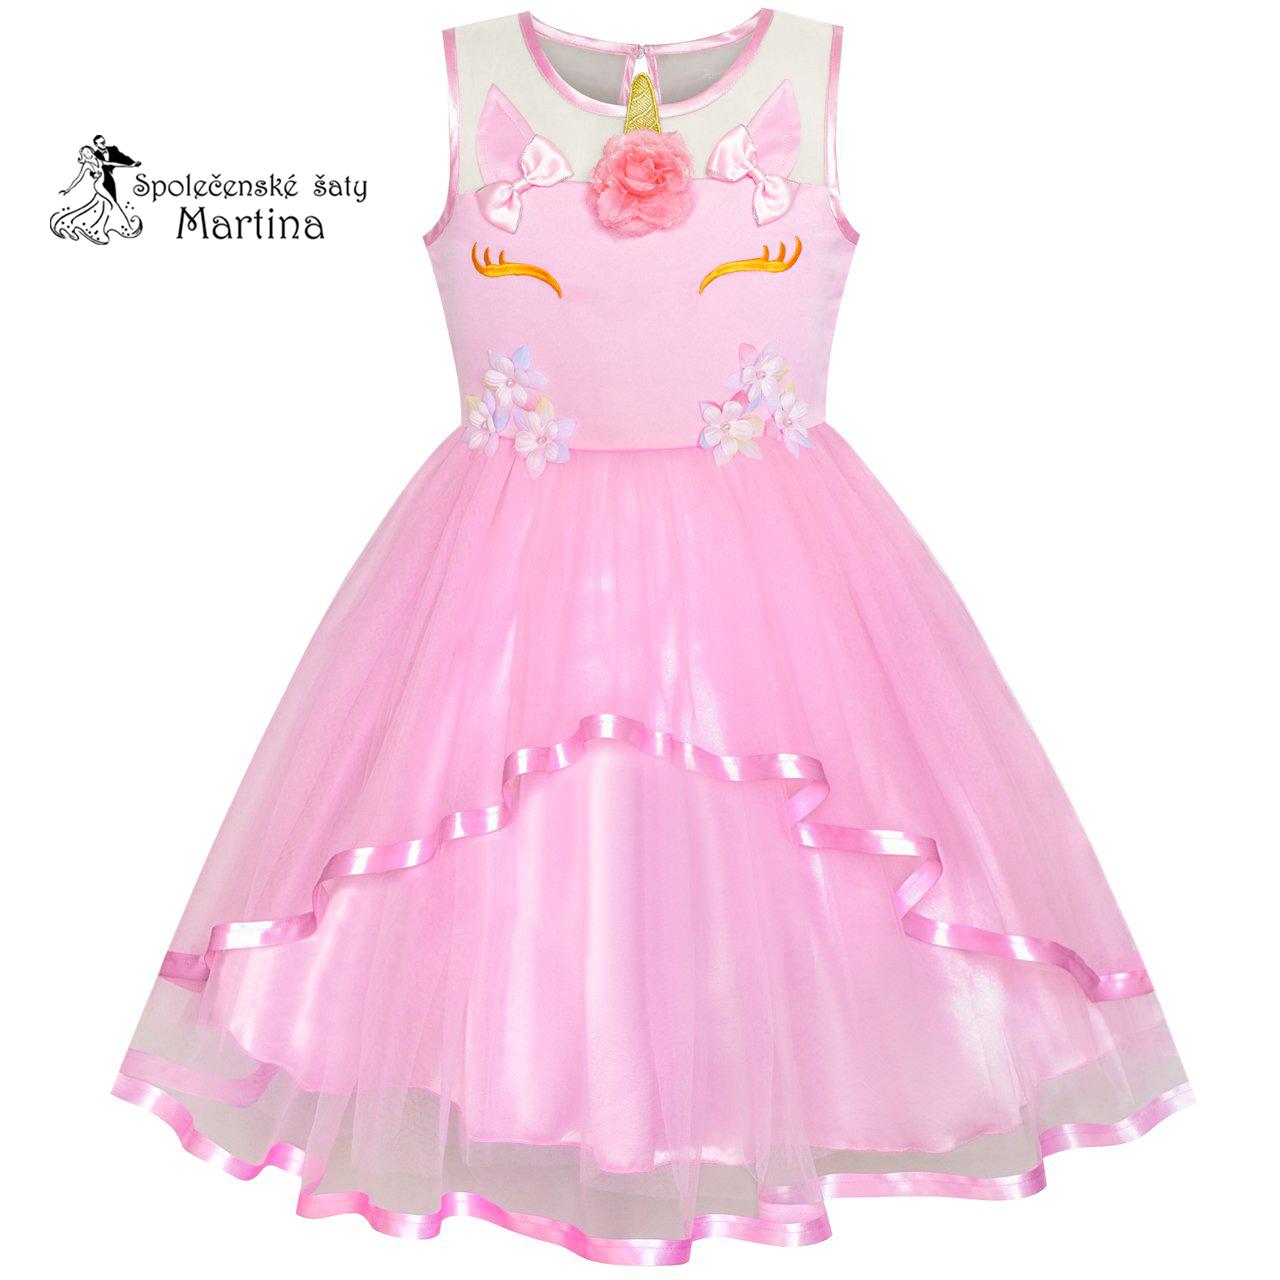 c9427572805c Dívčí šaty